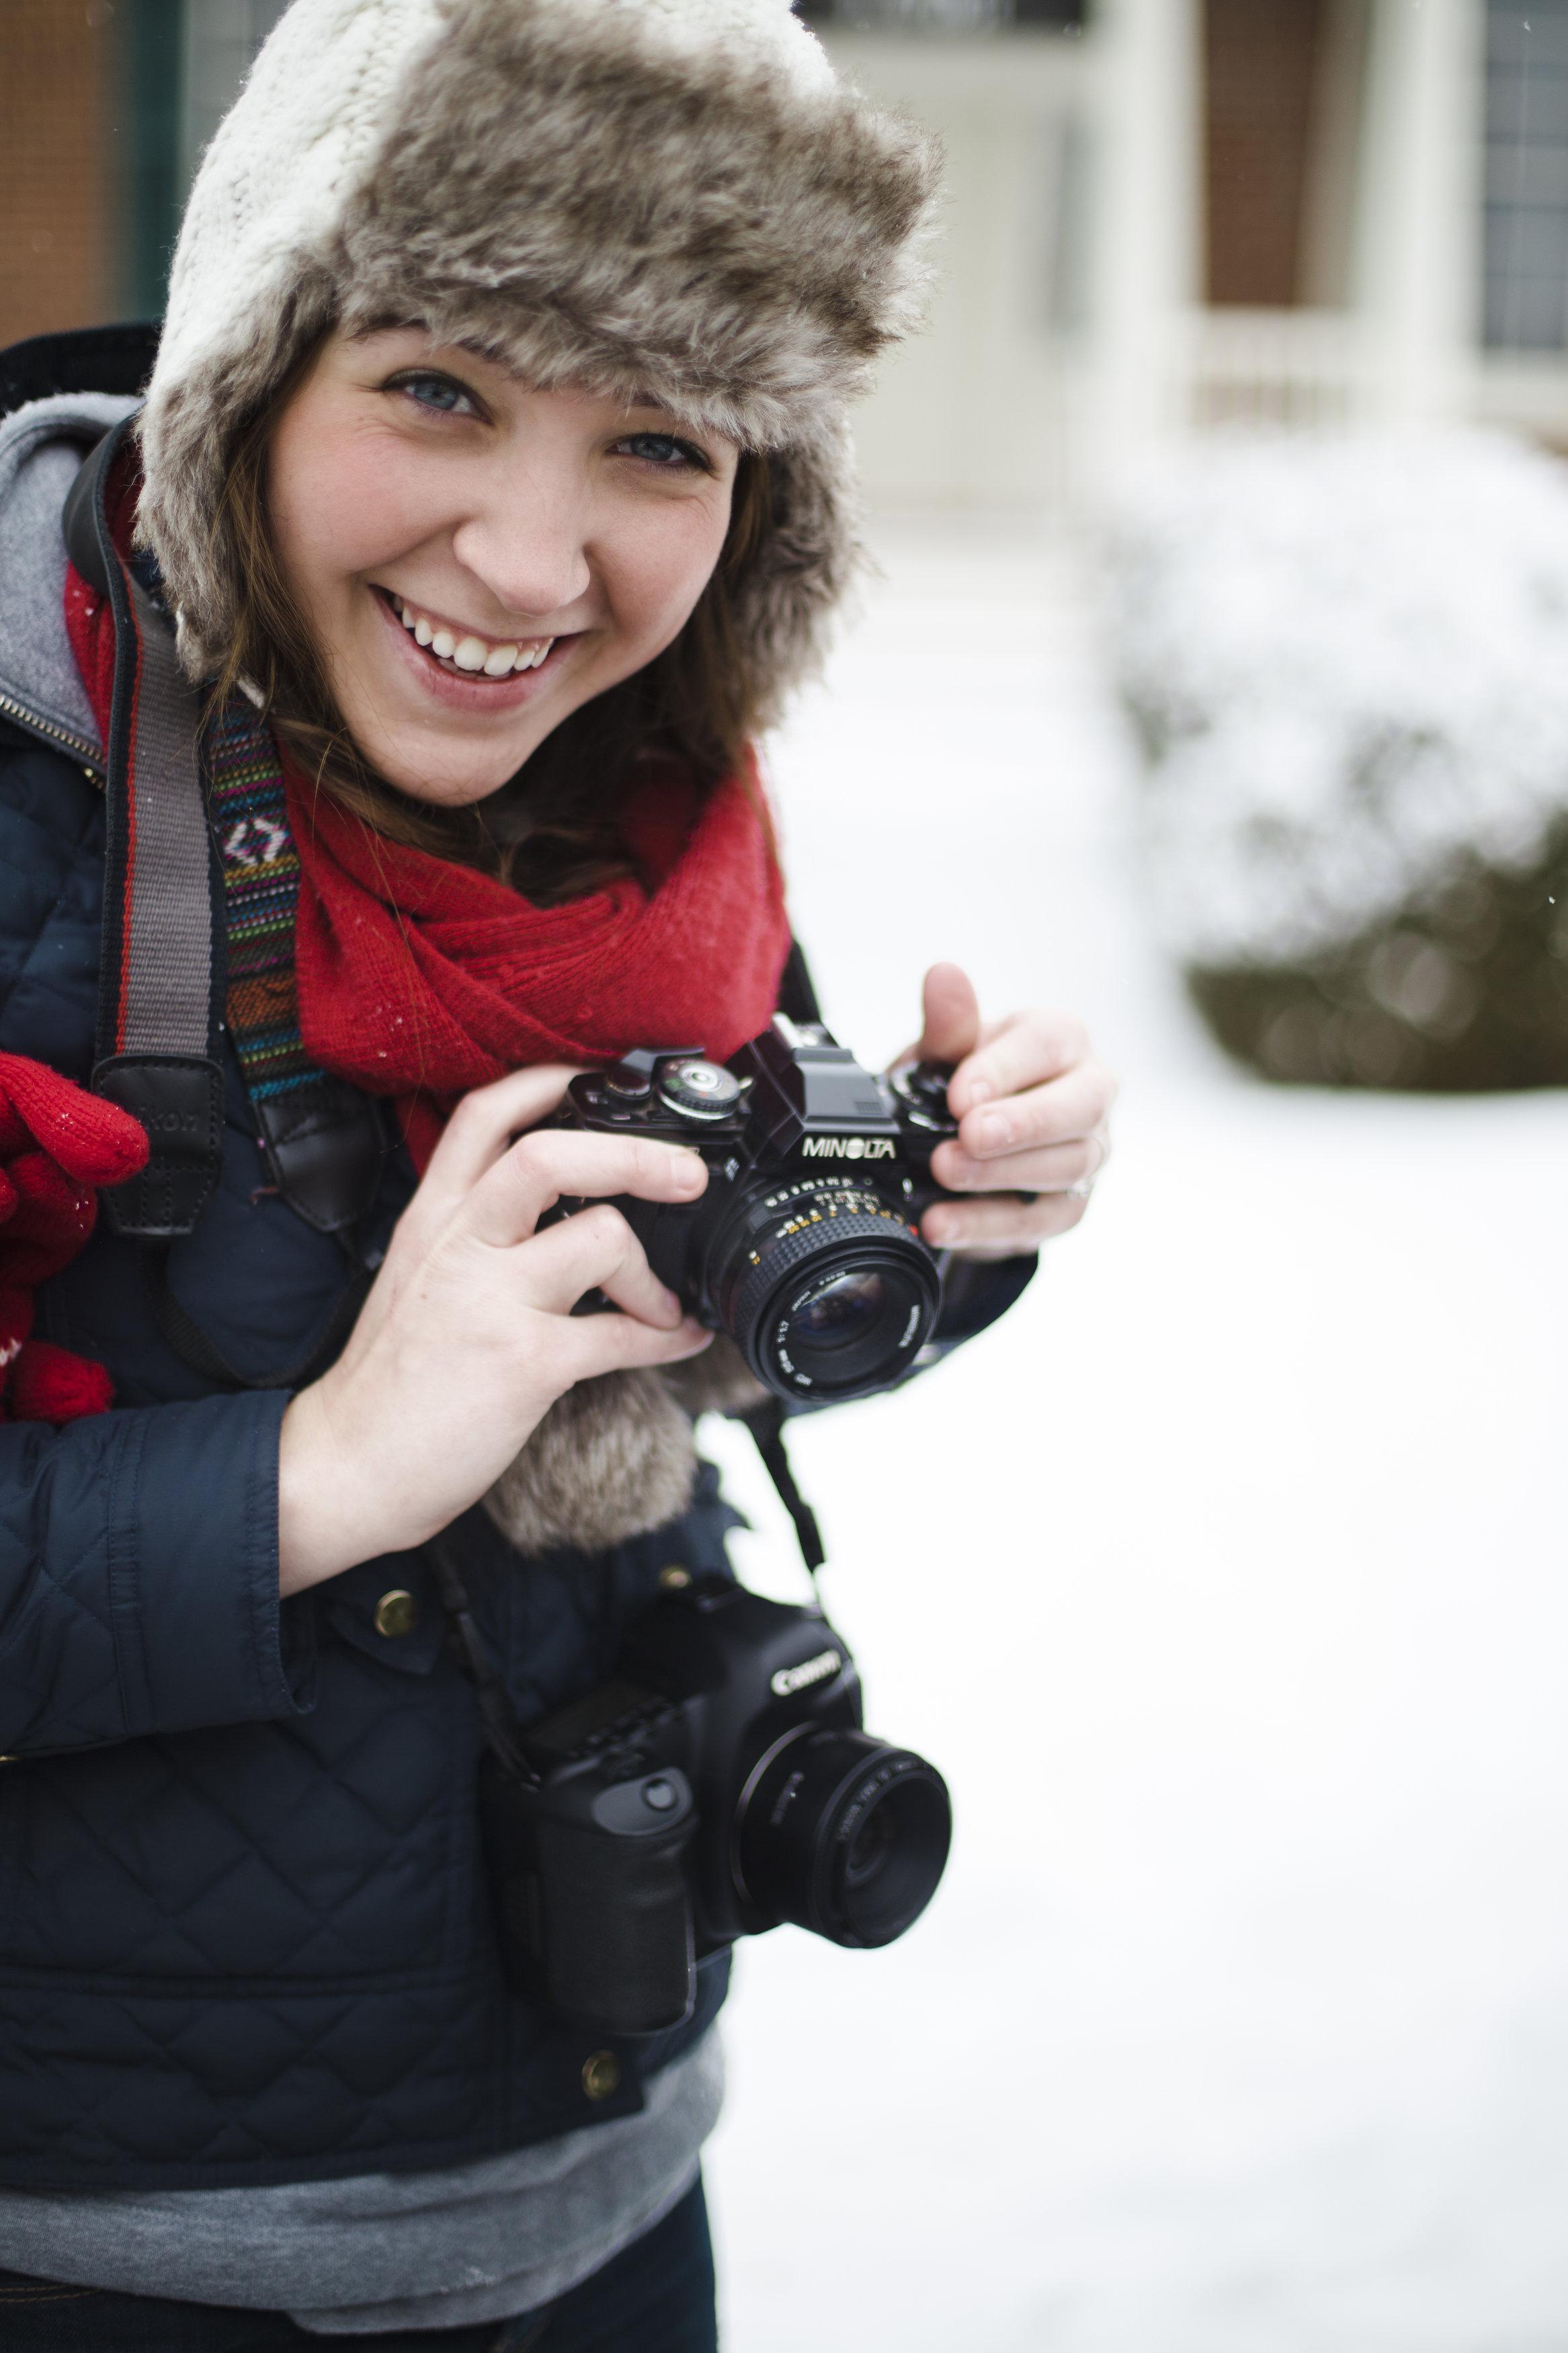 KaitlynBeckerPhotography_PersonalBrandImageryMarketingInfluencer.jpg